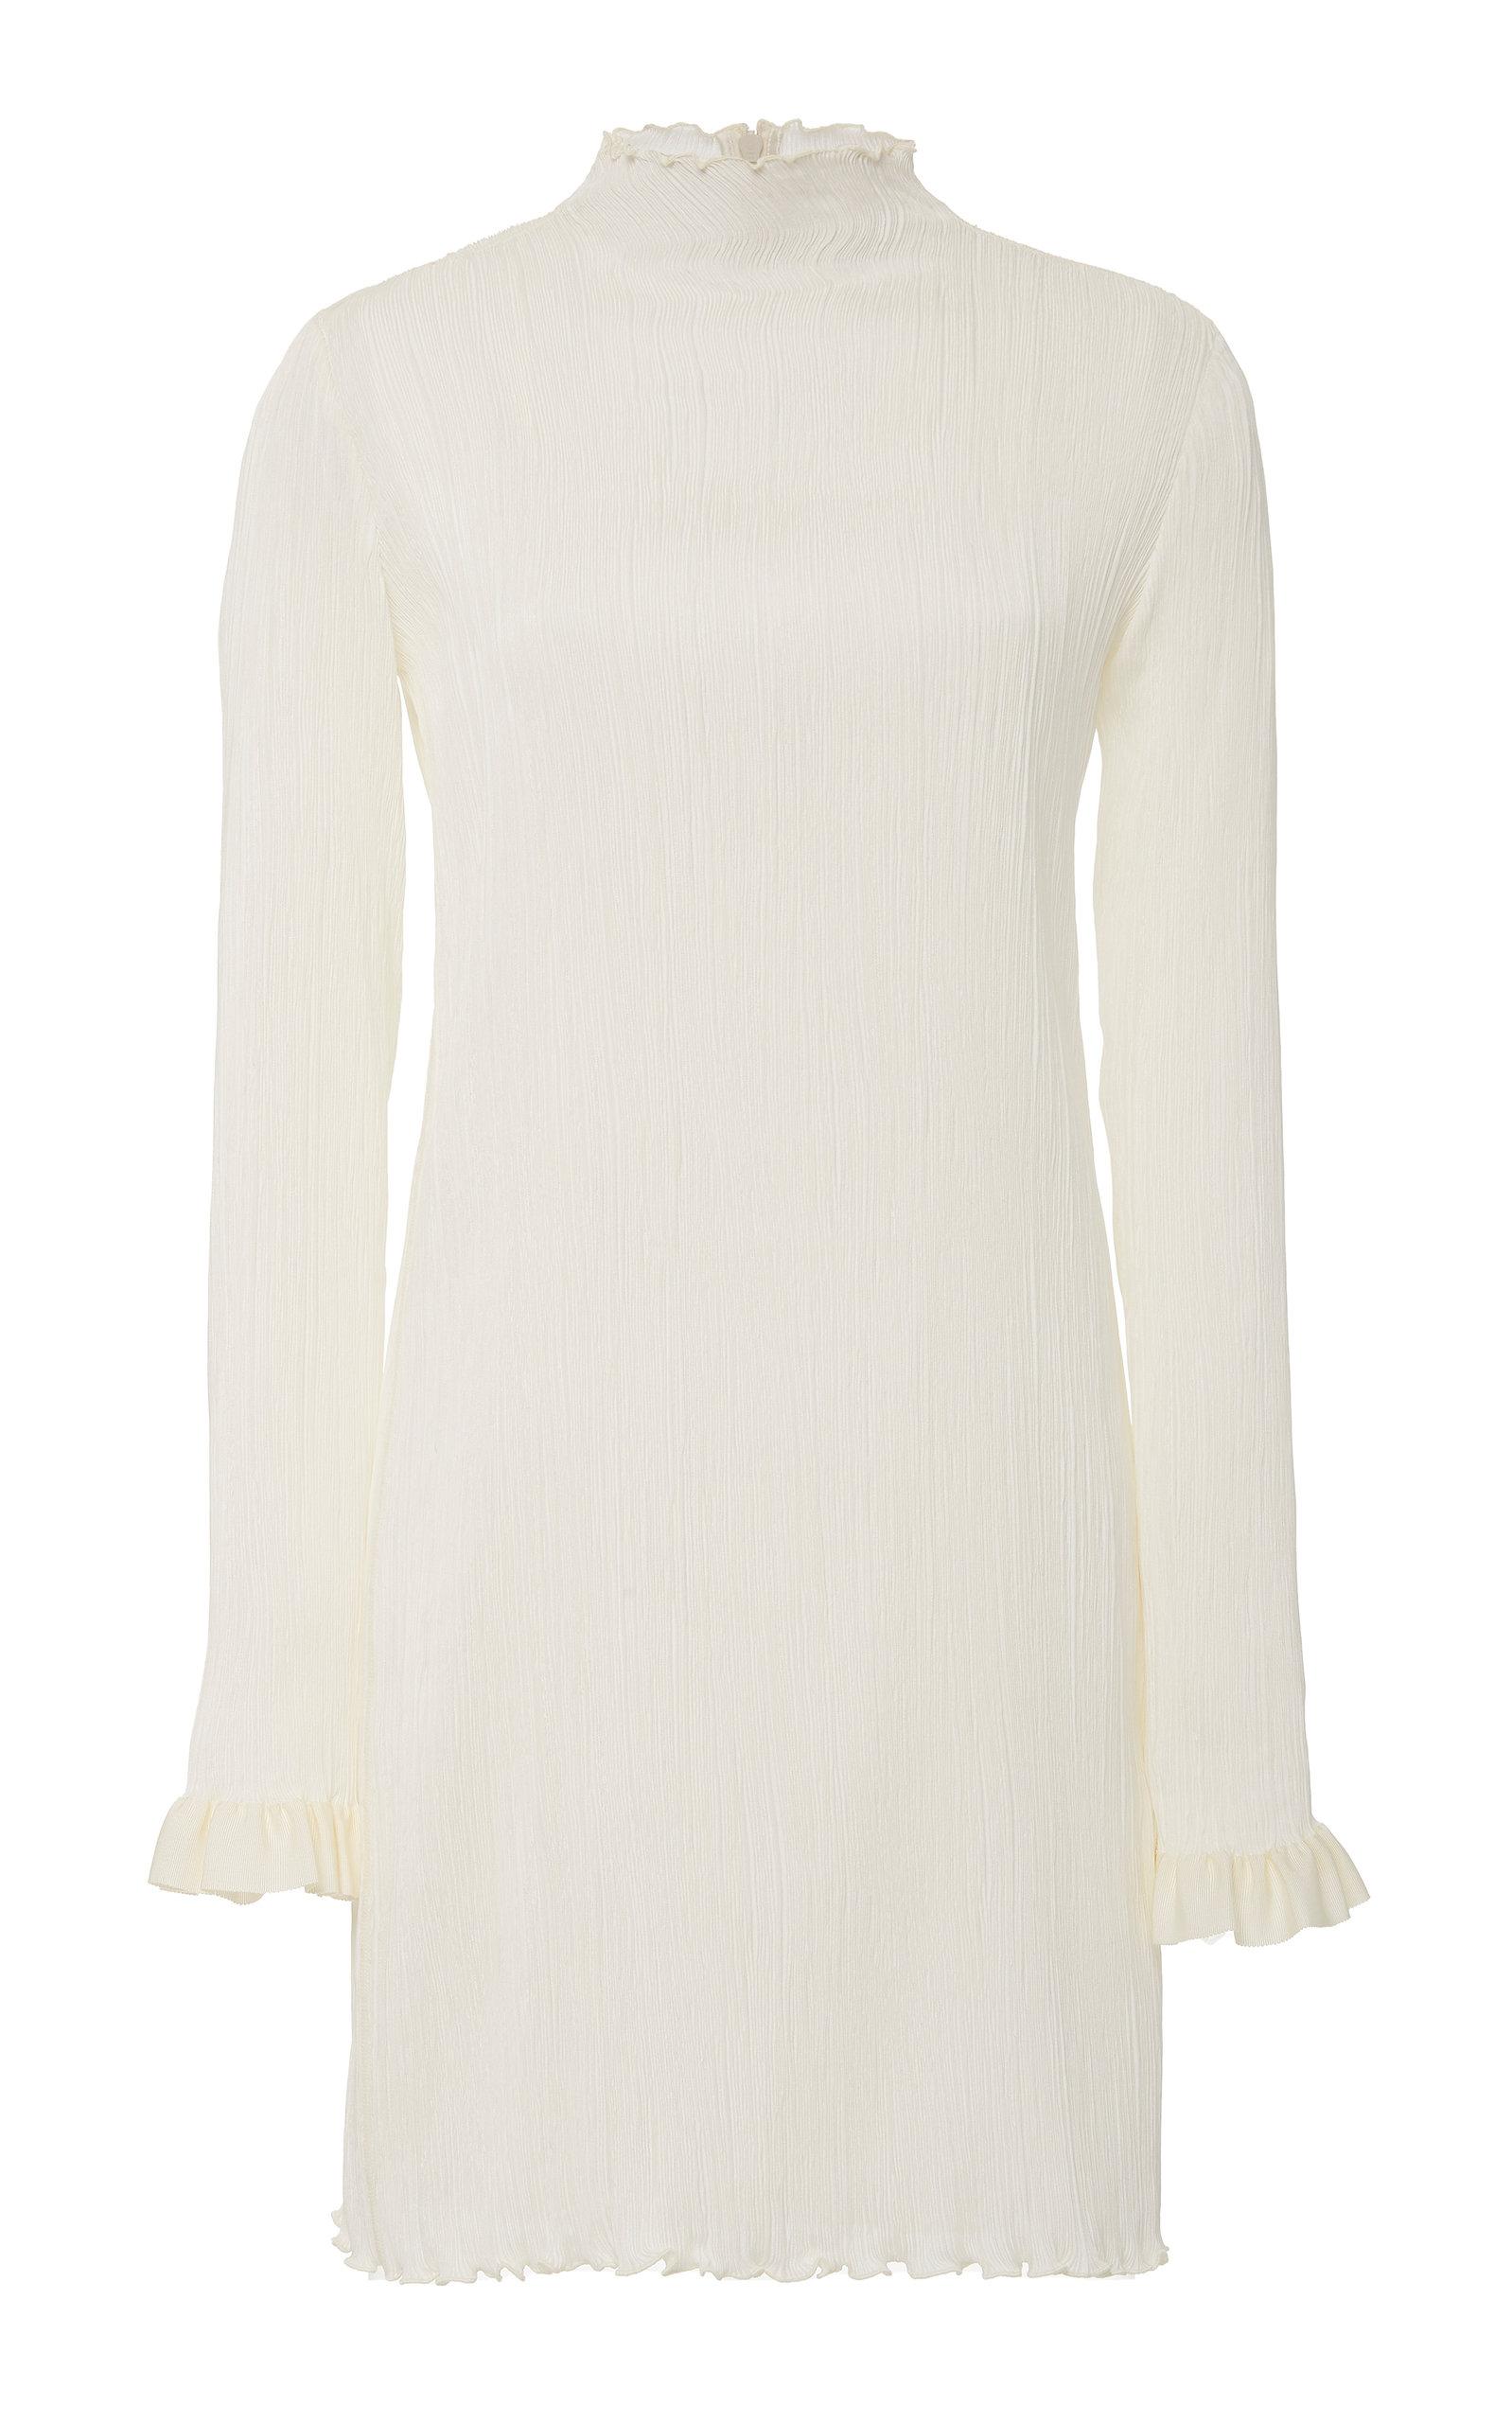 Buy Danielle Frankel Jamie High-Neck Silk Mini Dress online, shop Danielle Frankel at the best price